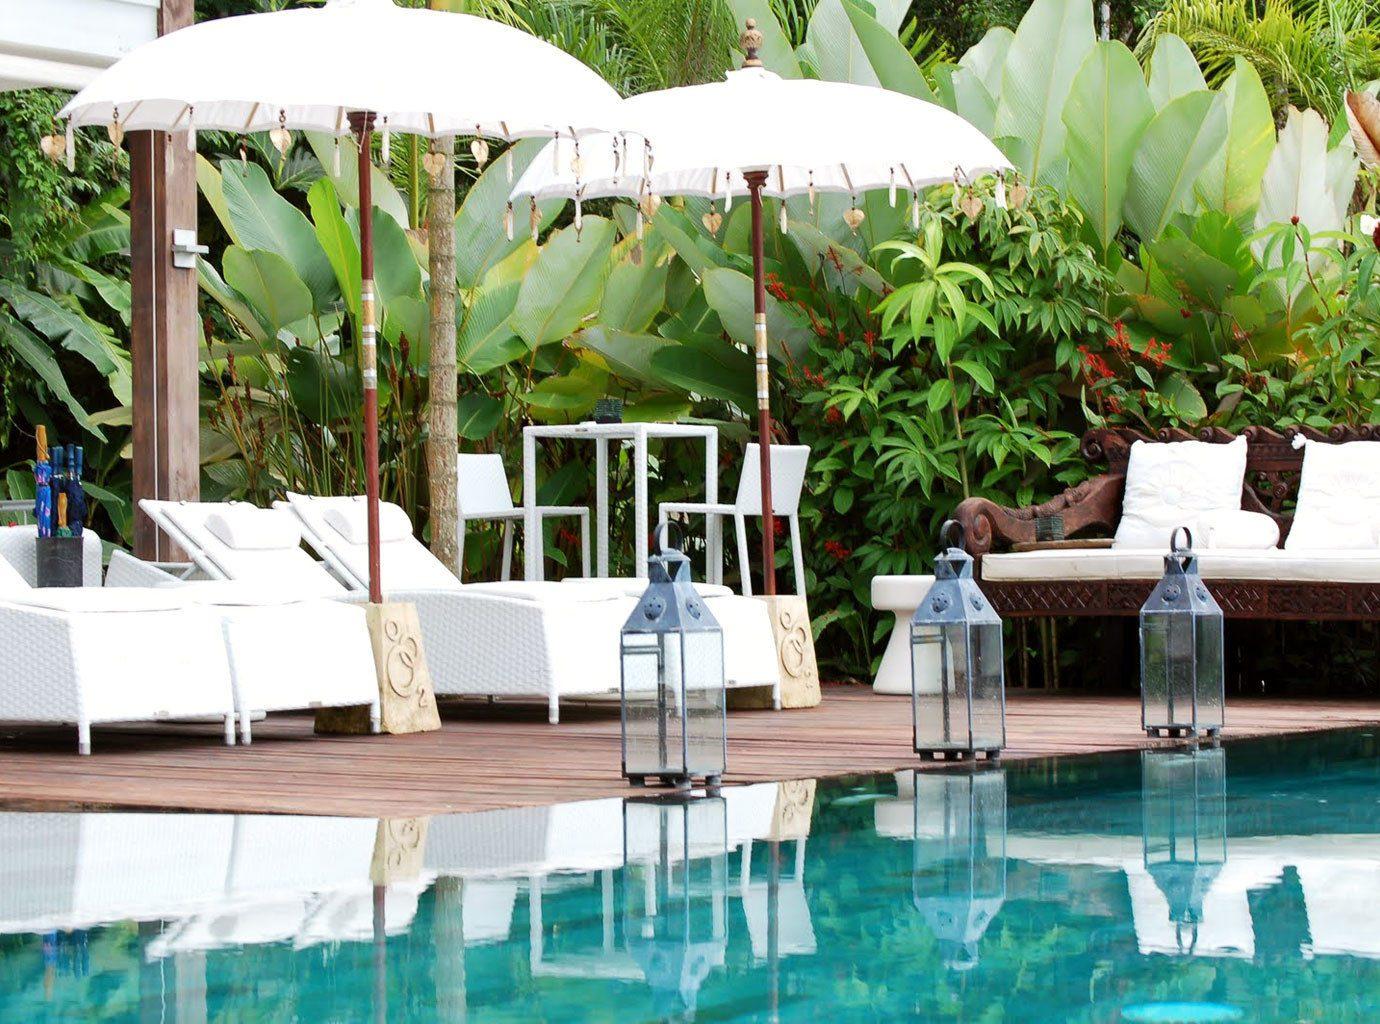 Drink Hotels Lounge Outdoors Play Pool Resort Trip Ideas tree outdoor leisure swimming pool estate backyard arecales Villa Courtyard